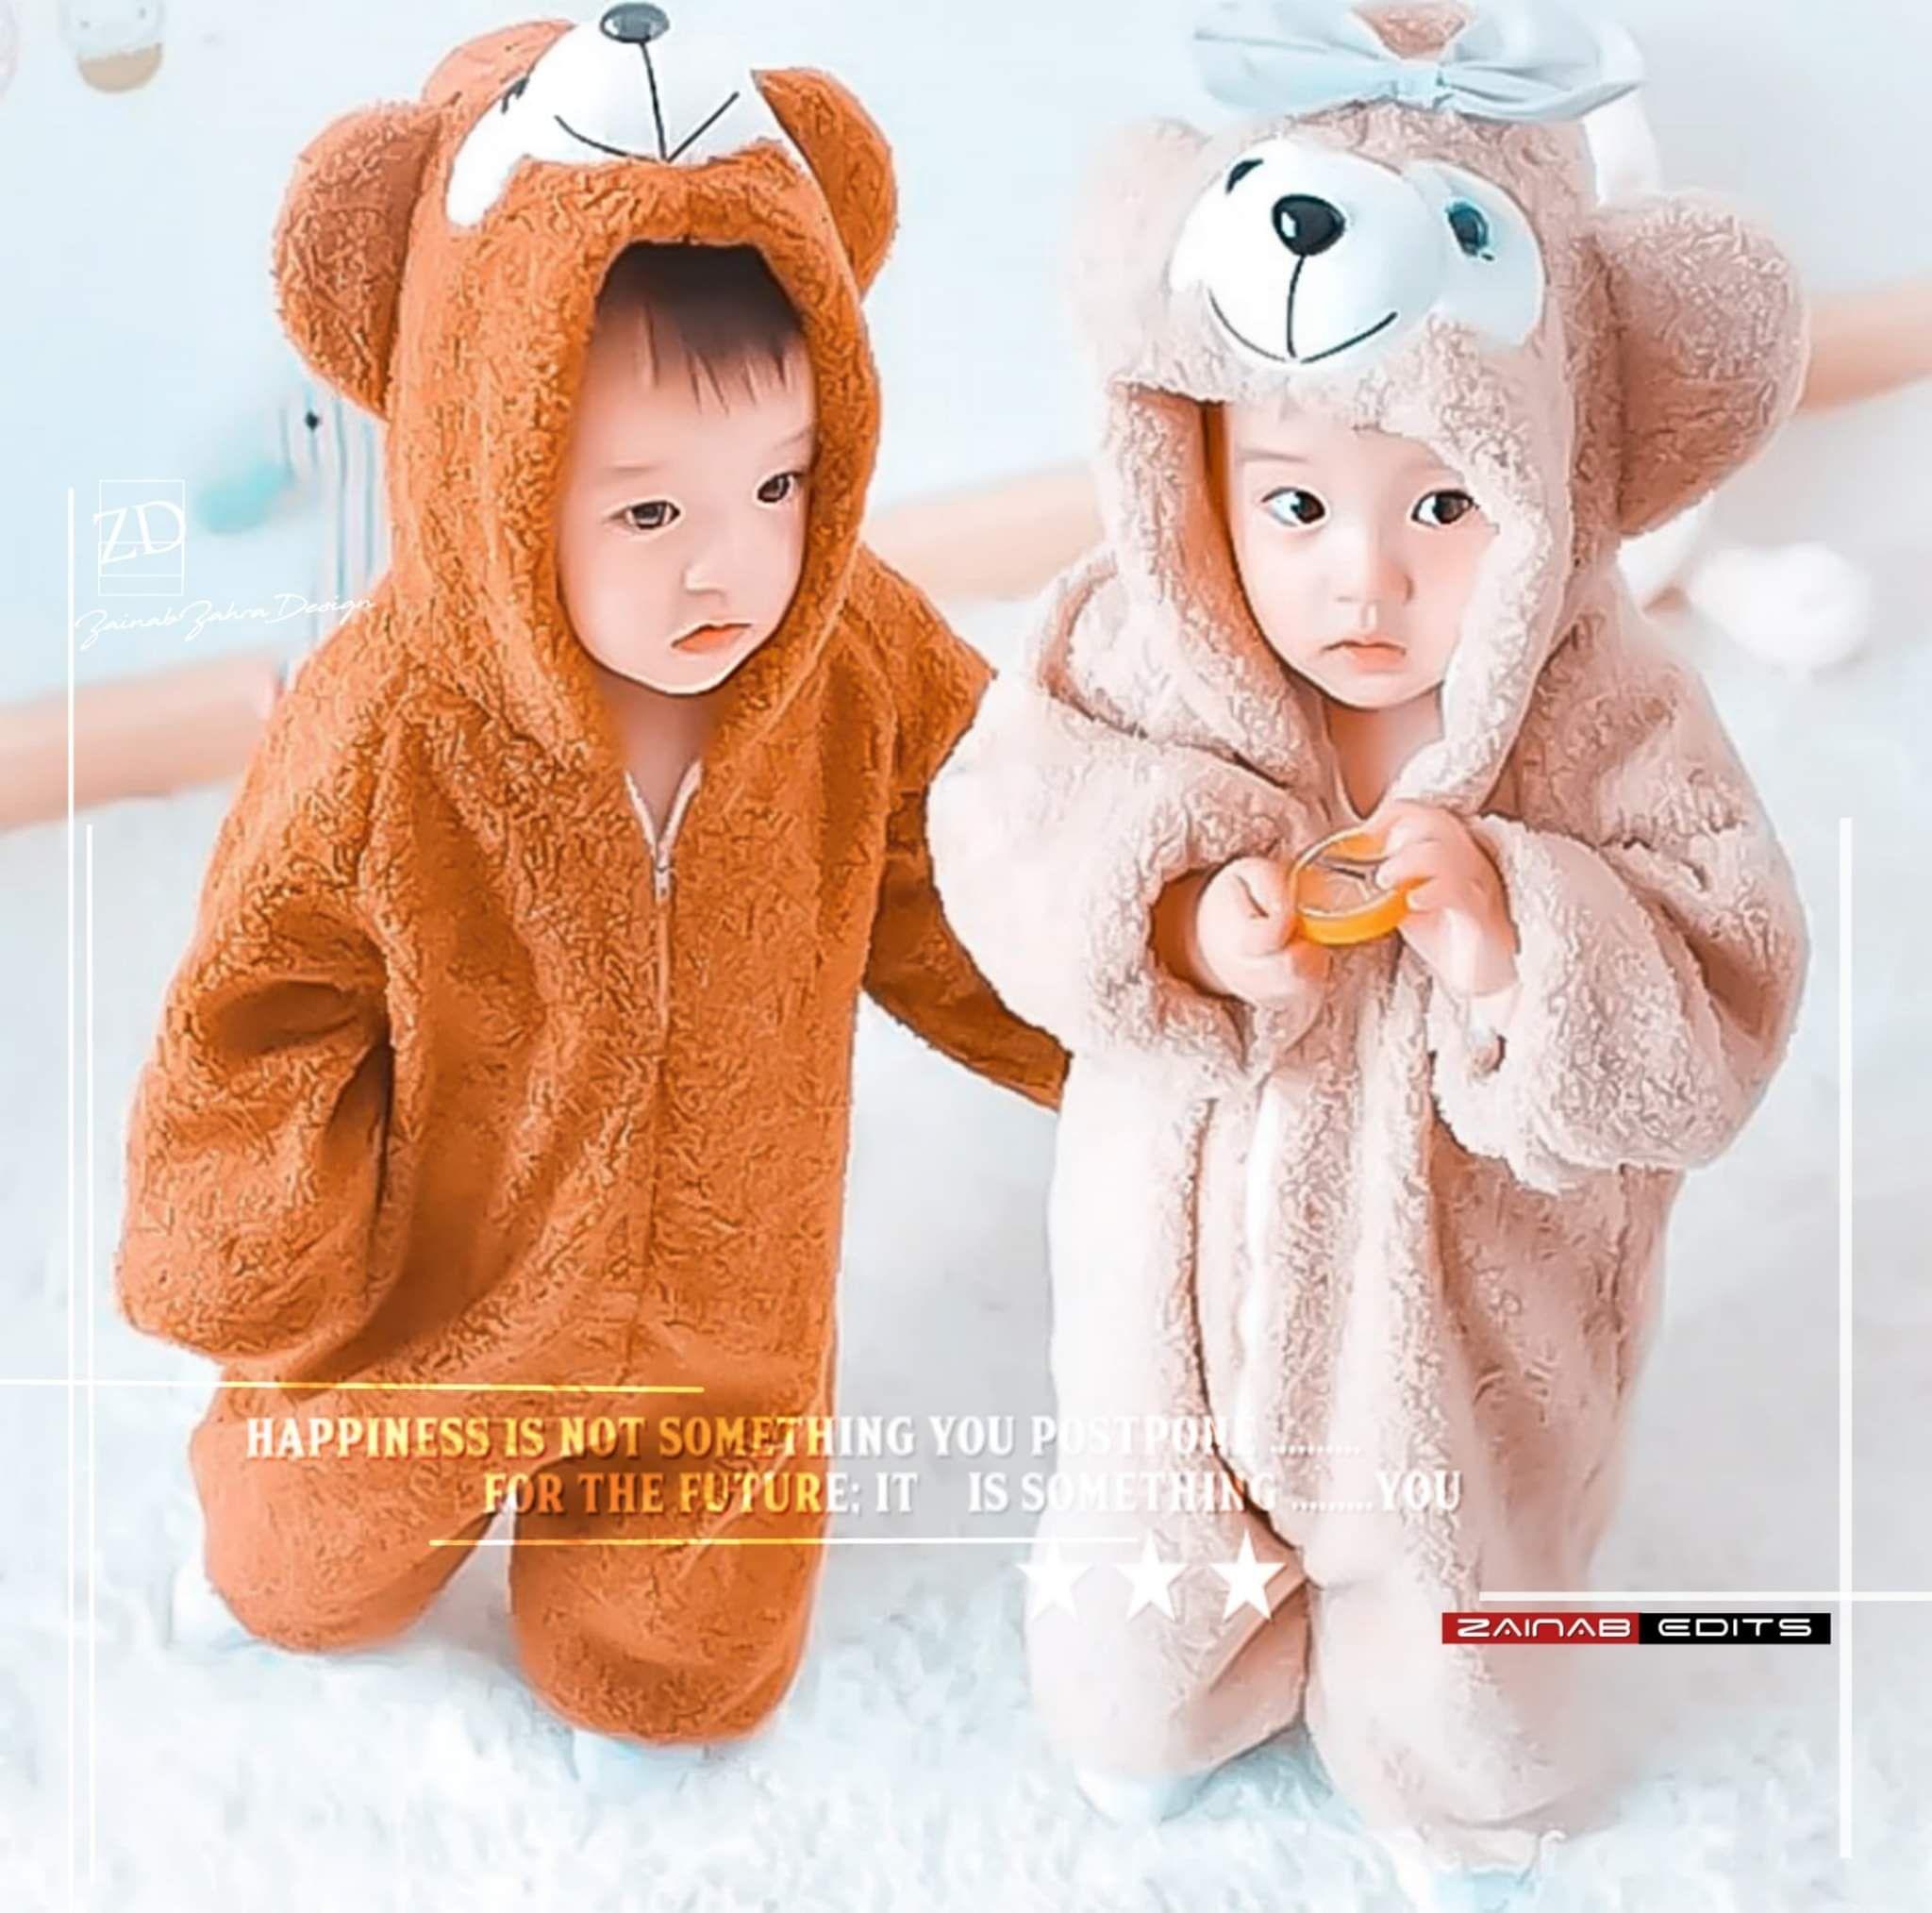 Cute Baby Dp For Whatsapp Cute Baby Couple Cute Babies Cute Girl Hd Wallpaper